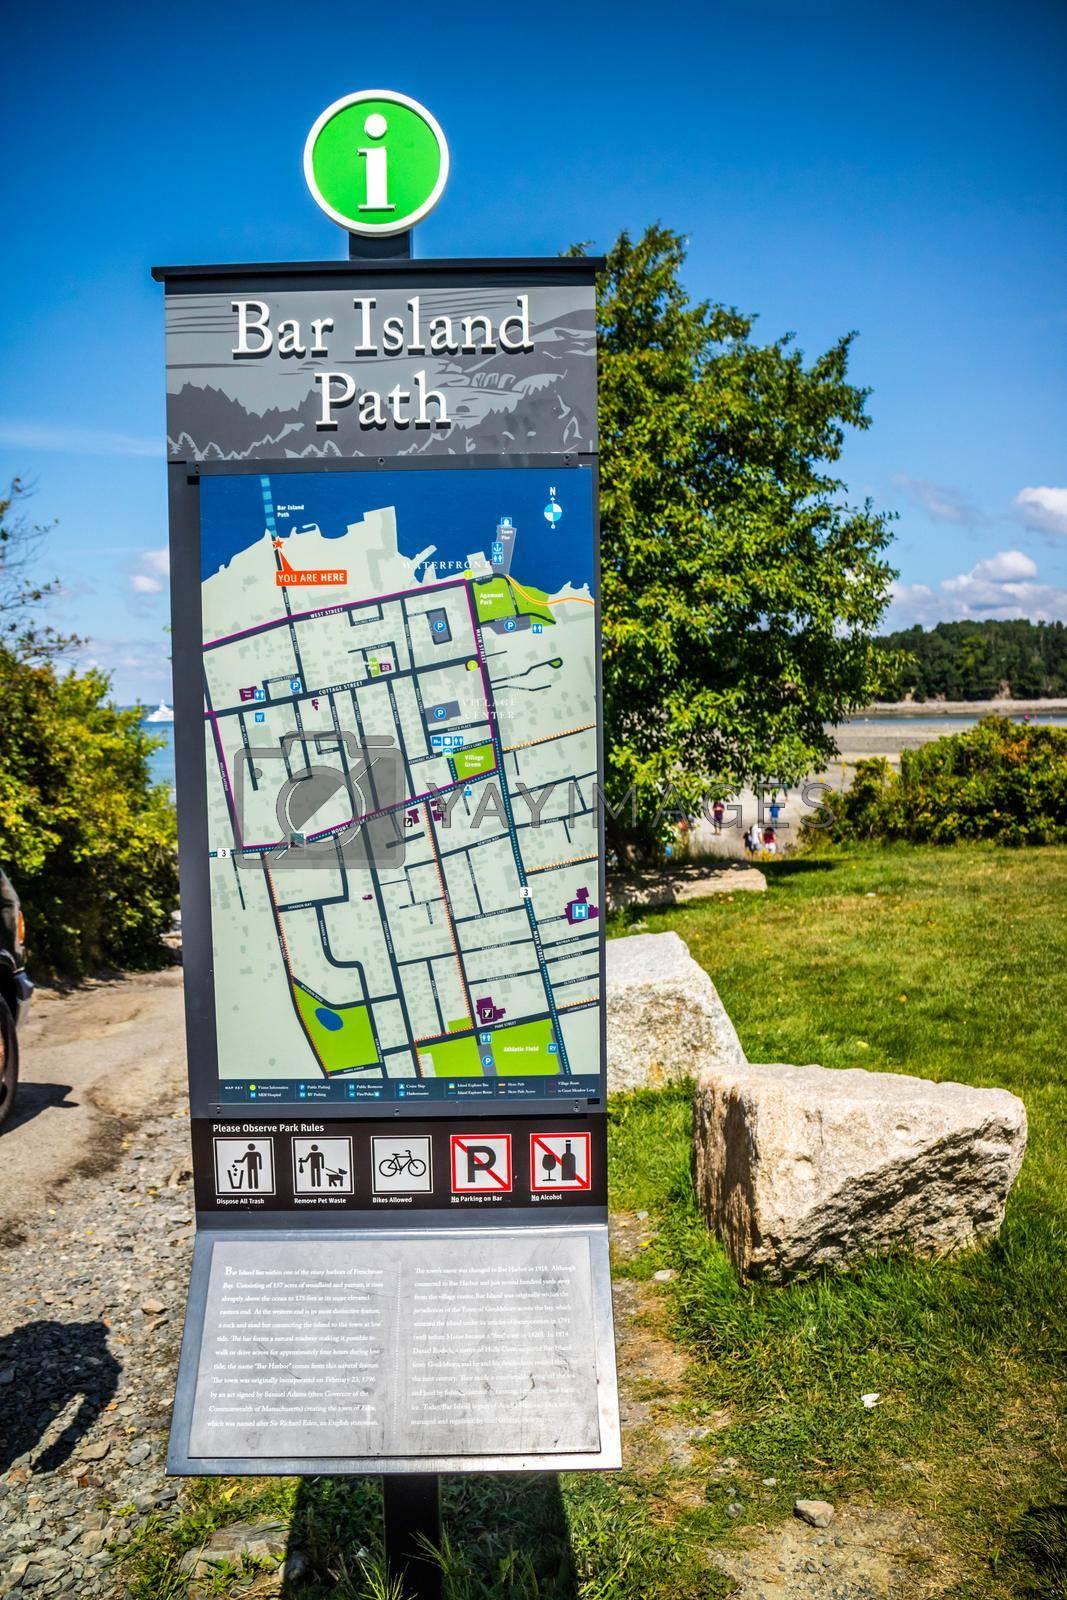 Royalty free image of Bar Harbor, ME, USA - August 19, 2018: The Bar Island Path Trialhead by cherialguire